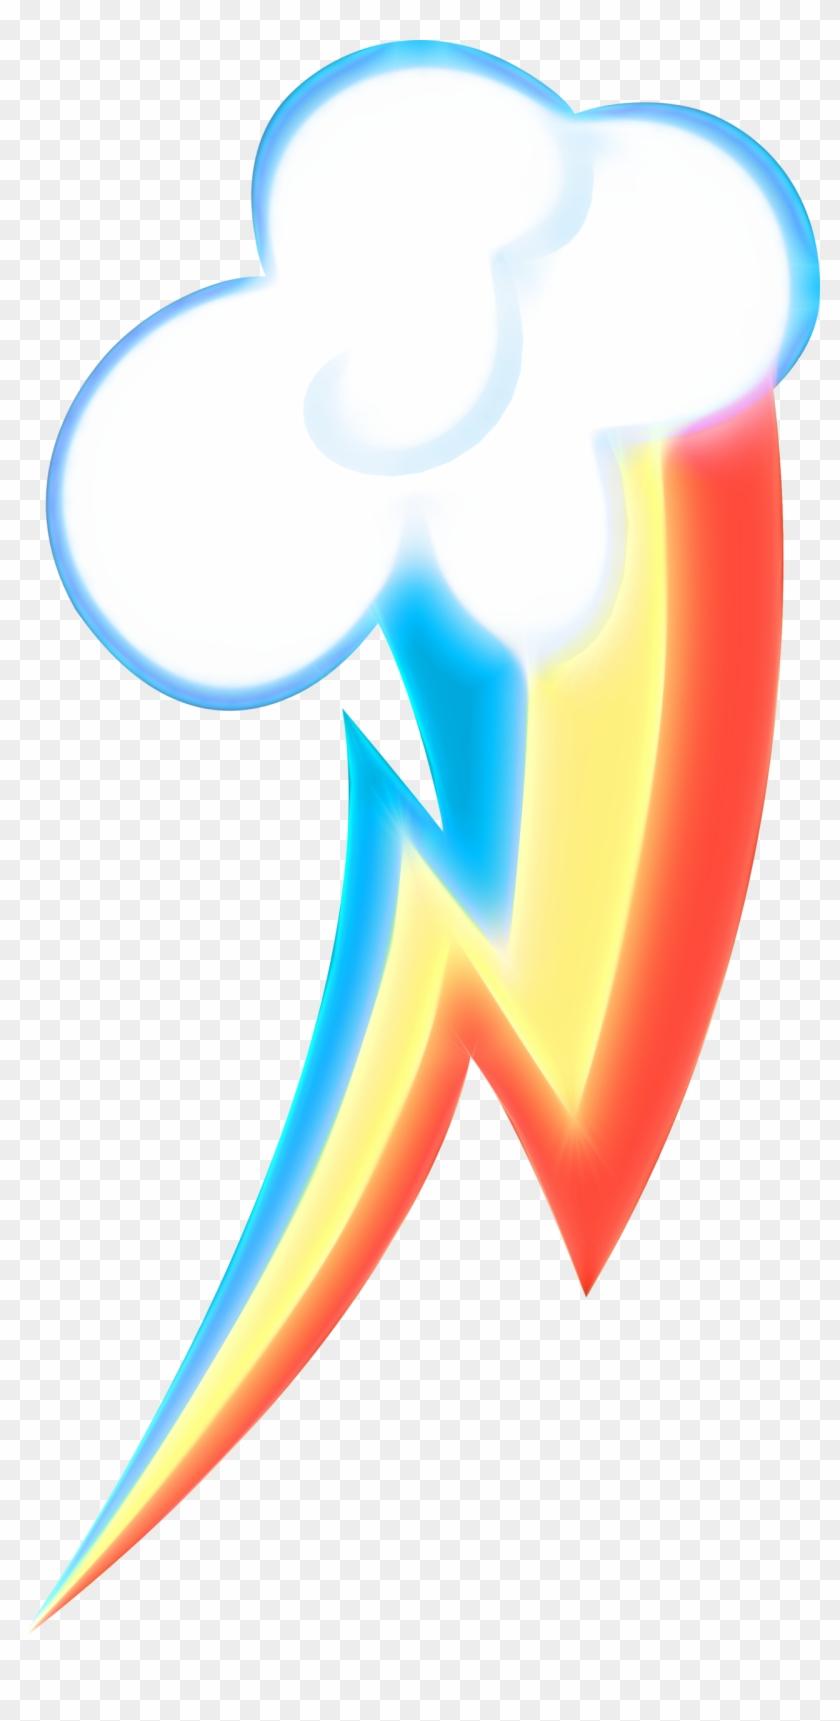 Neon Rainbow Dash S Cutie Mark Clipart 5281474 Pikpng